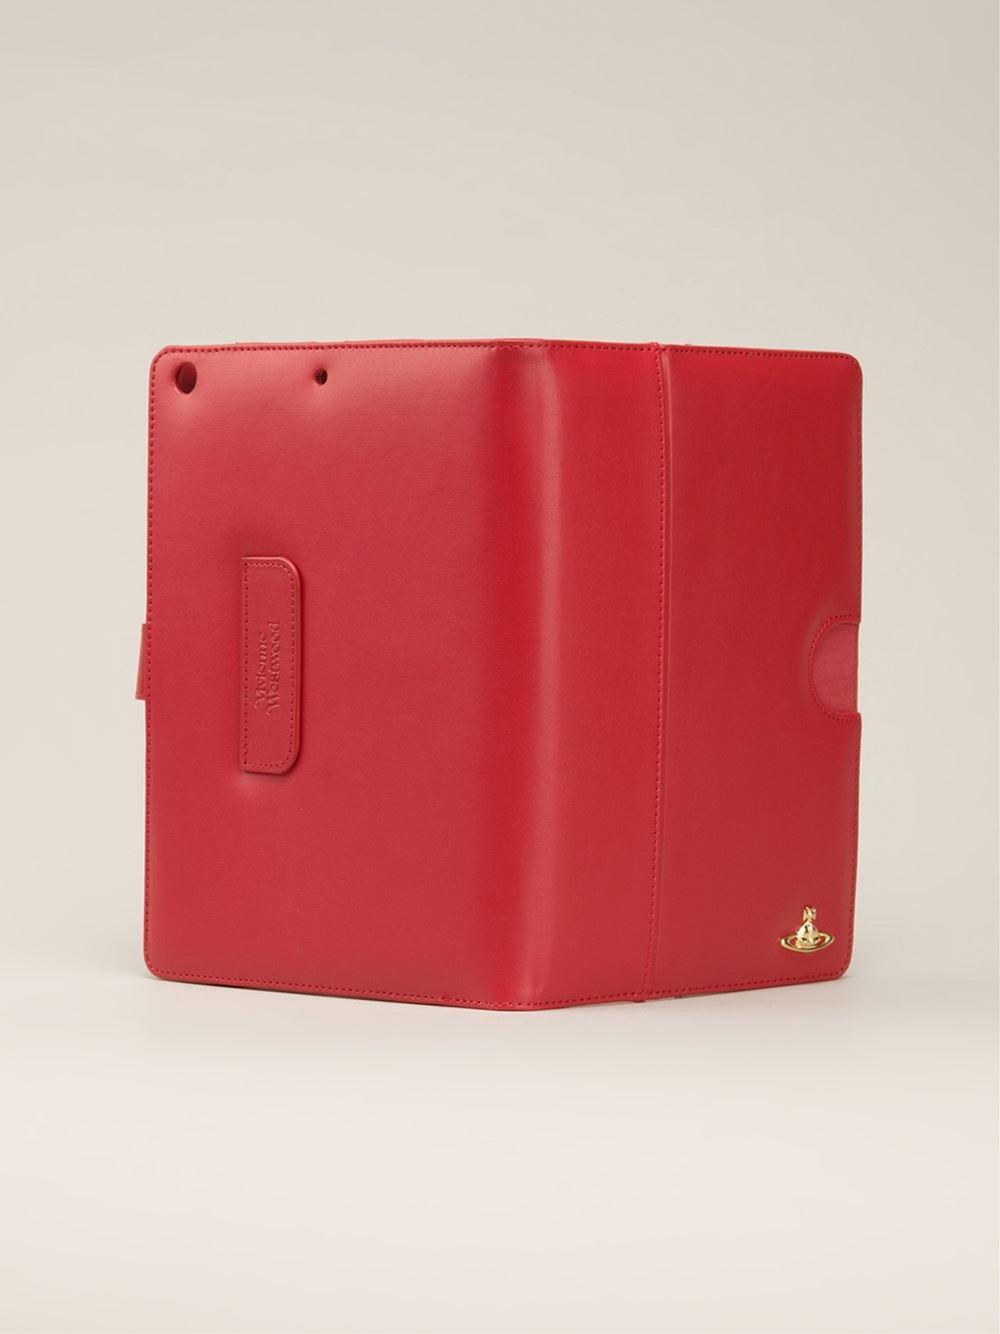 Vivienne westwood Ipad Air Case in Red | Lyst